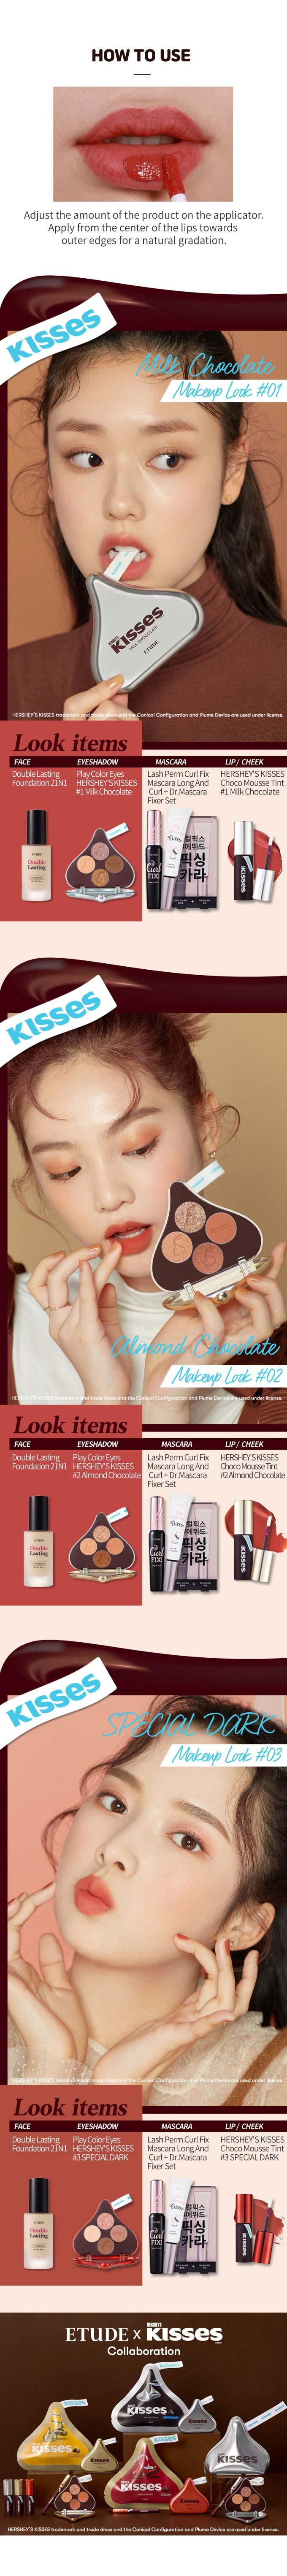 kisses-choco-mousse-tint-korea-cosmetics4.jpg